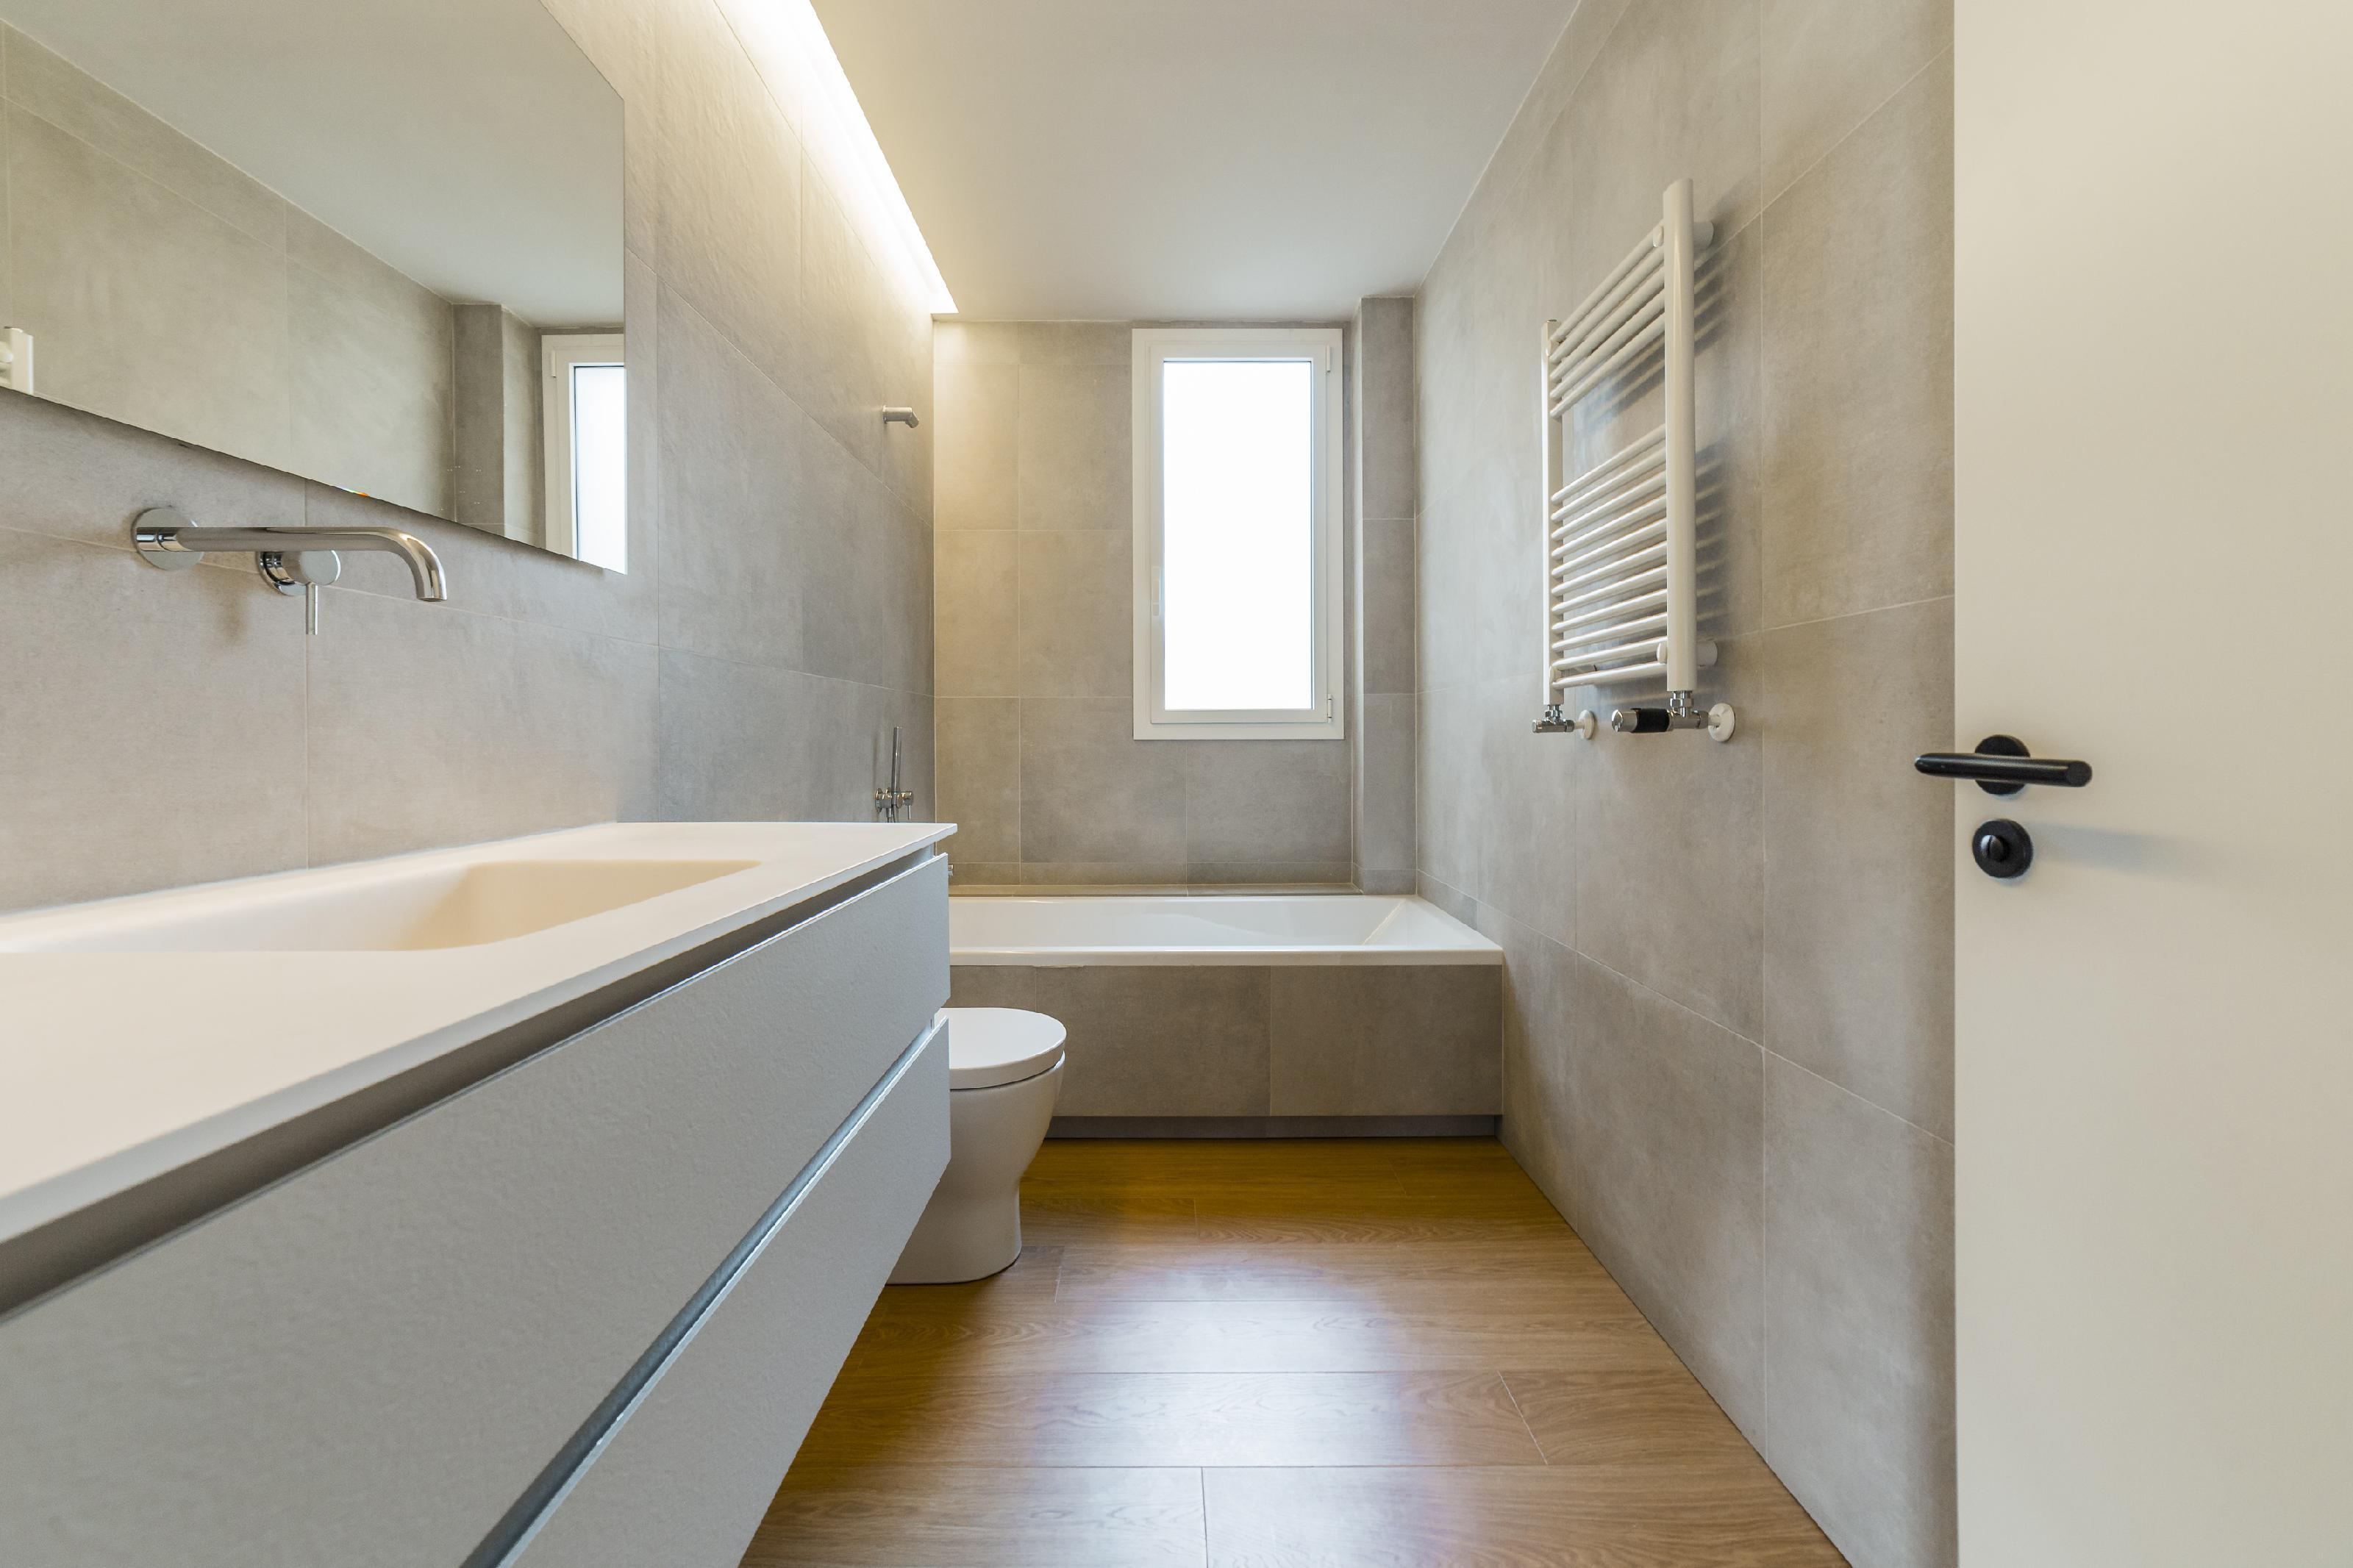 253492 Flat for sale in Sarrià-Sant Gervasi, Sant Gervasi-Galvany 25